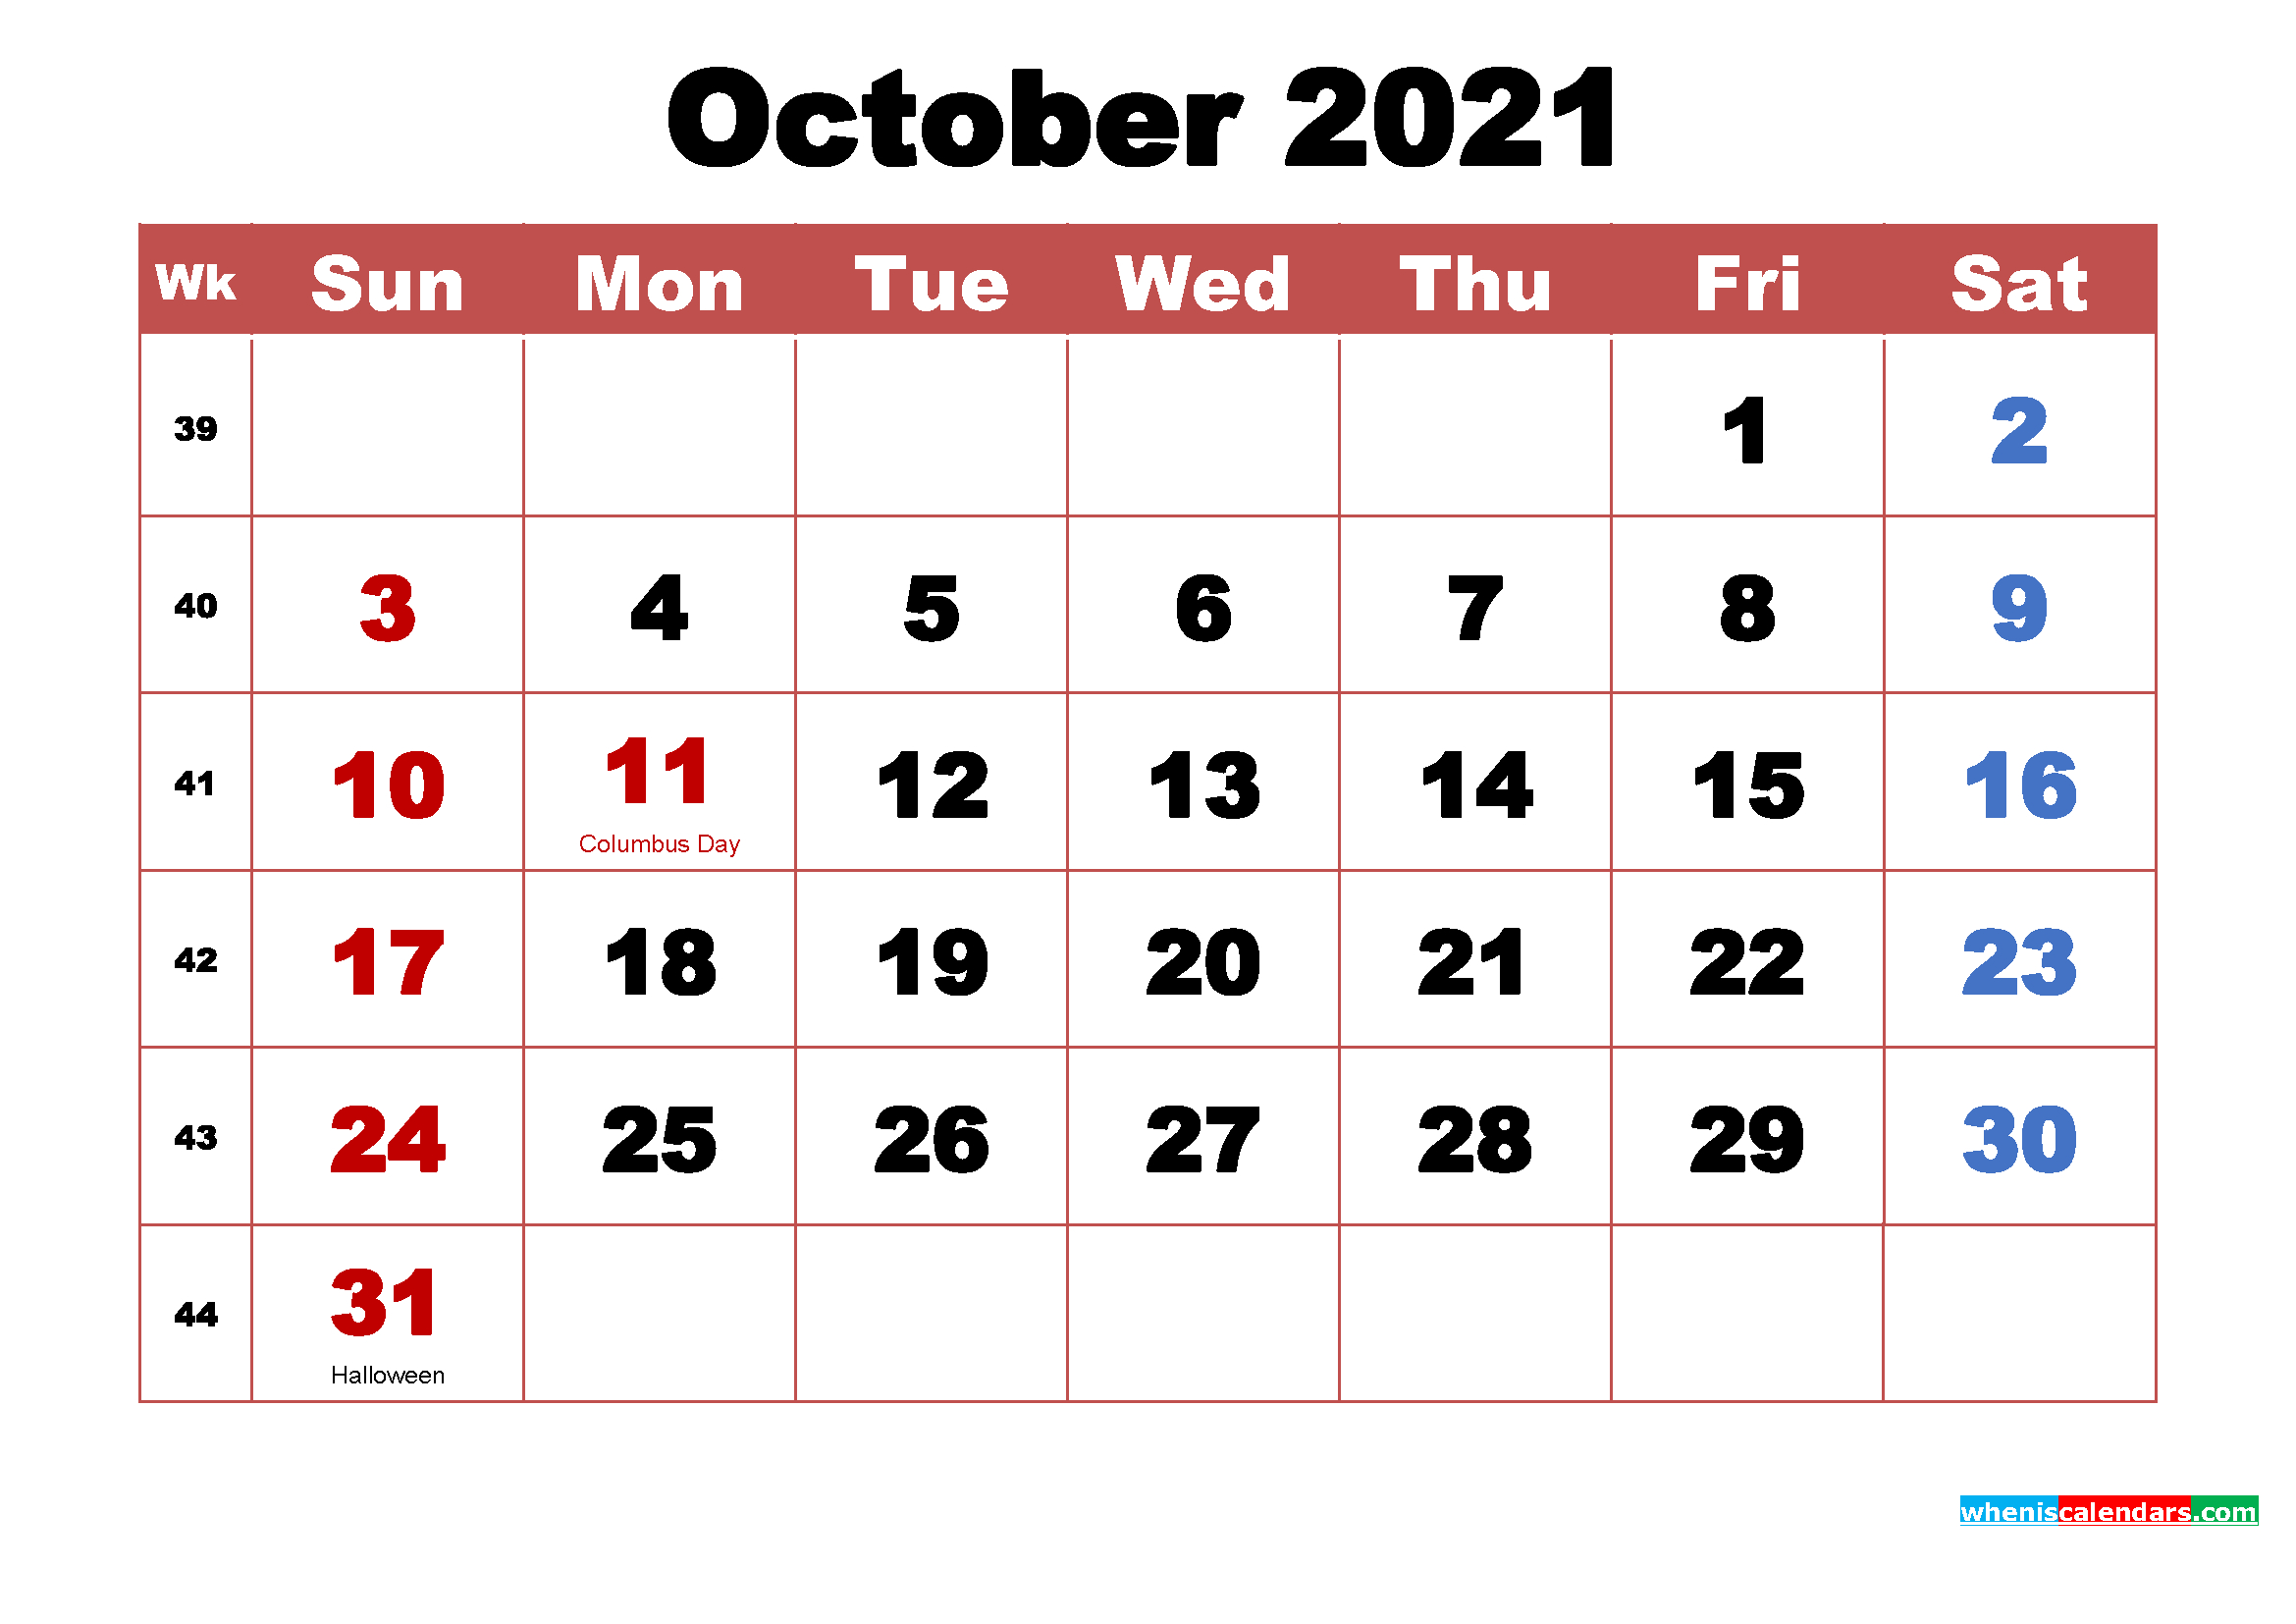 October 2021 Calendar Wallpaper High Resolution